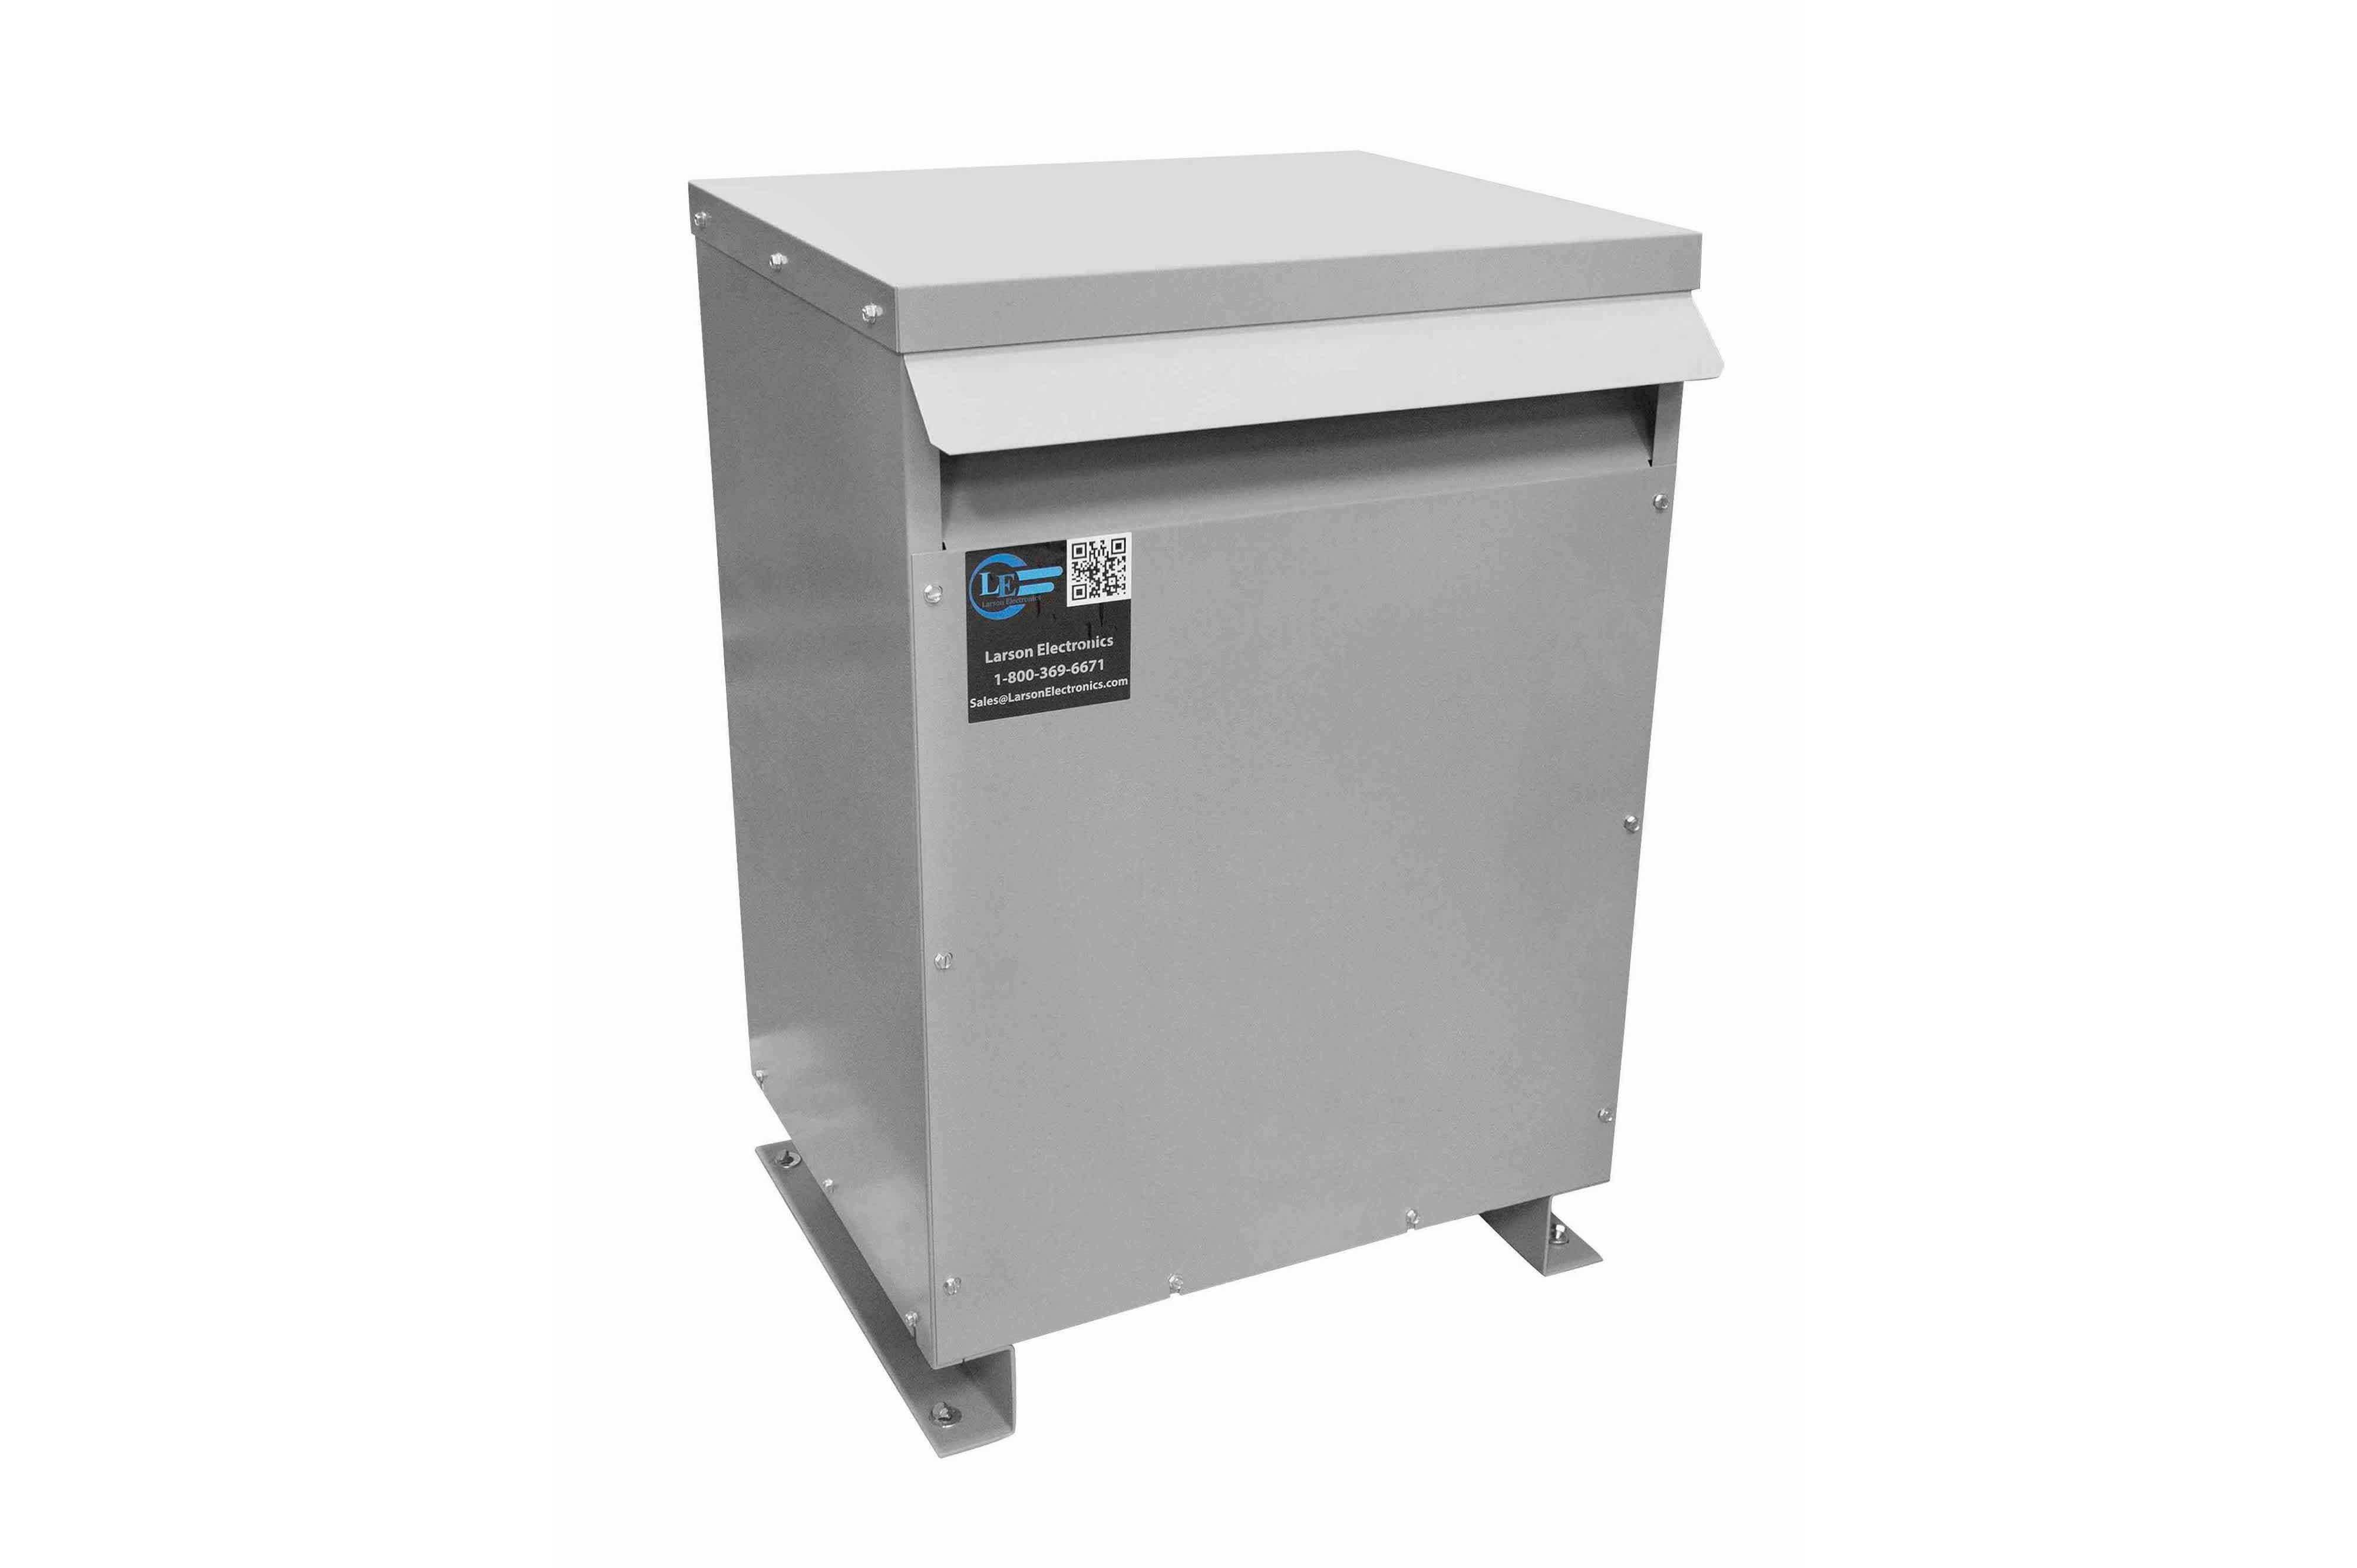 1000 kVA 3PH Isolation Transformer, 240V Wye Primary, 400V Delta Secondary, N3R, Ventilated, 60 Hz